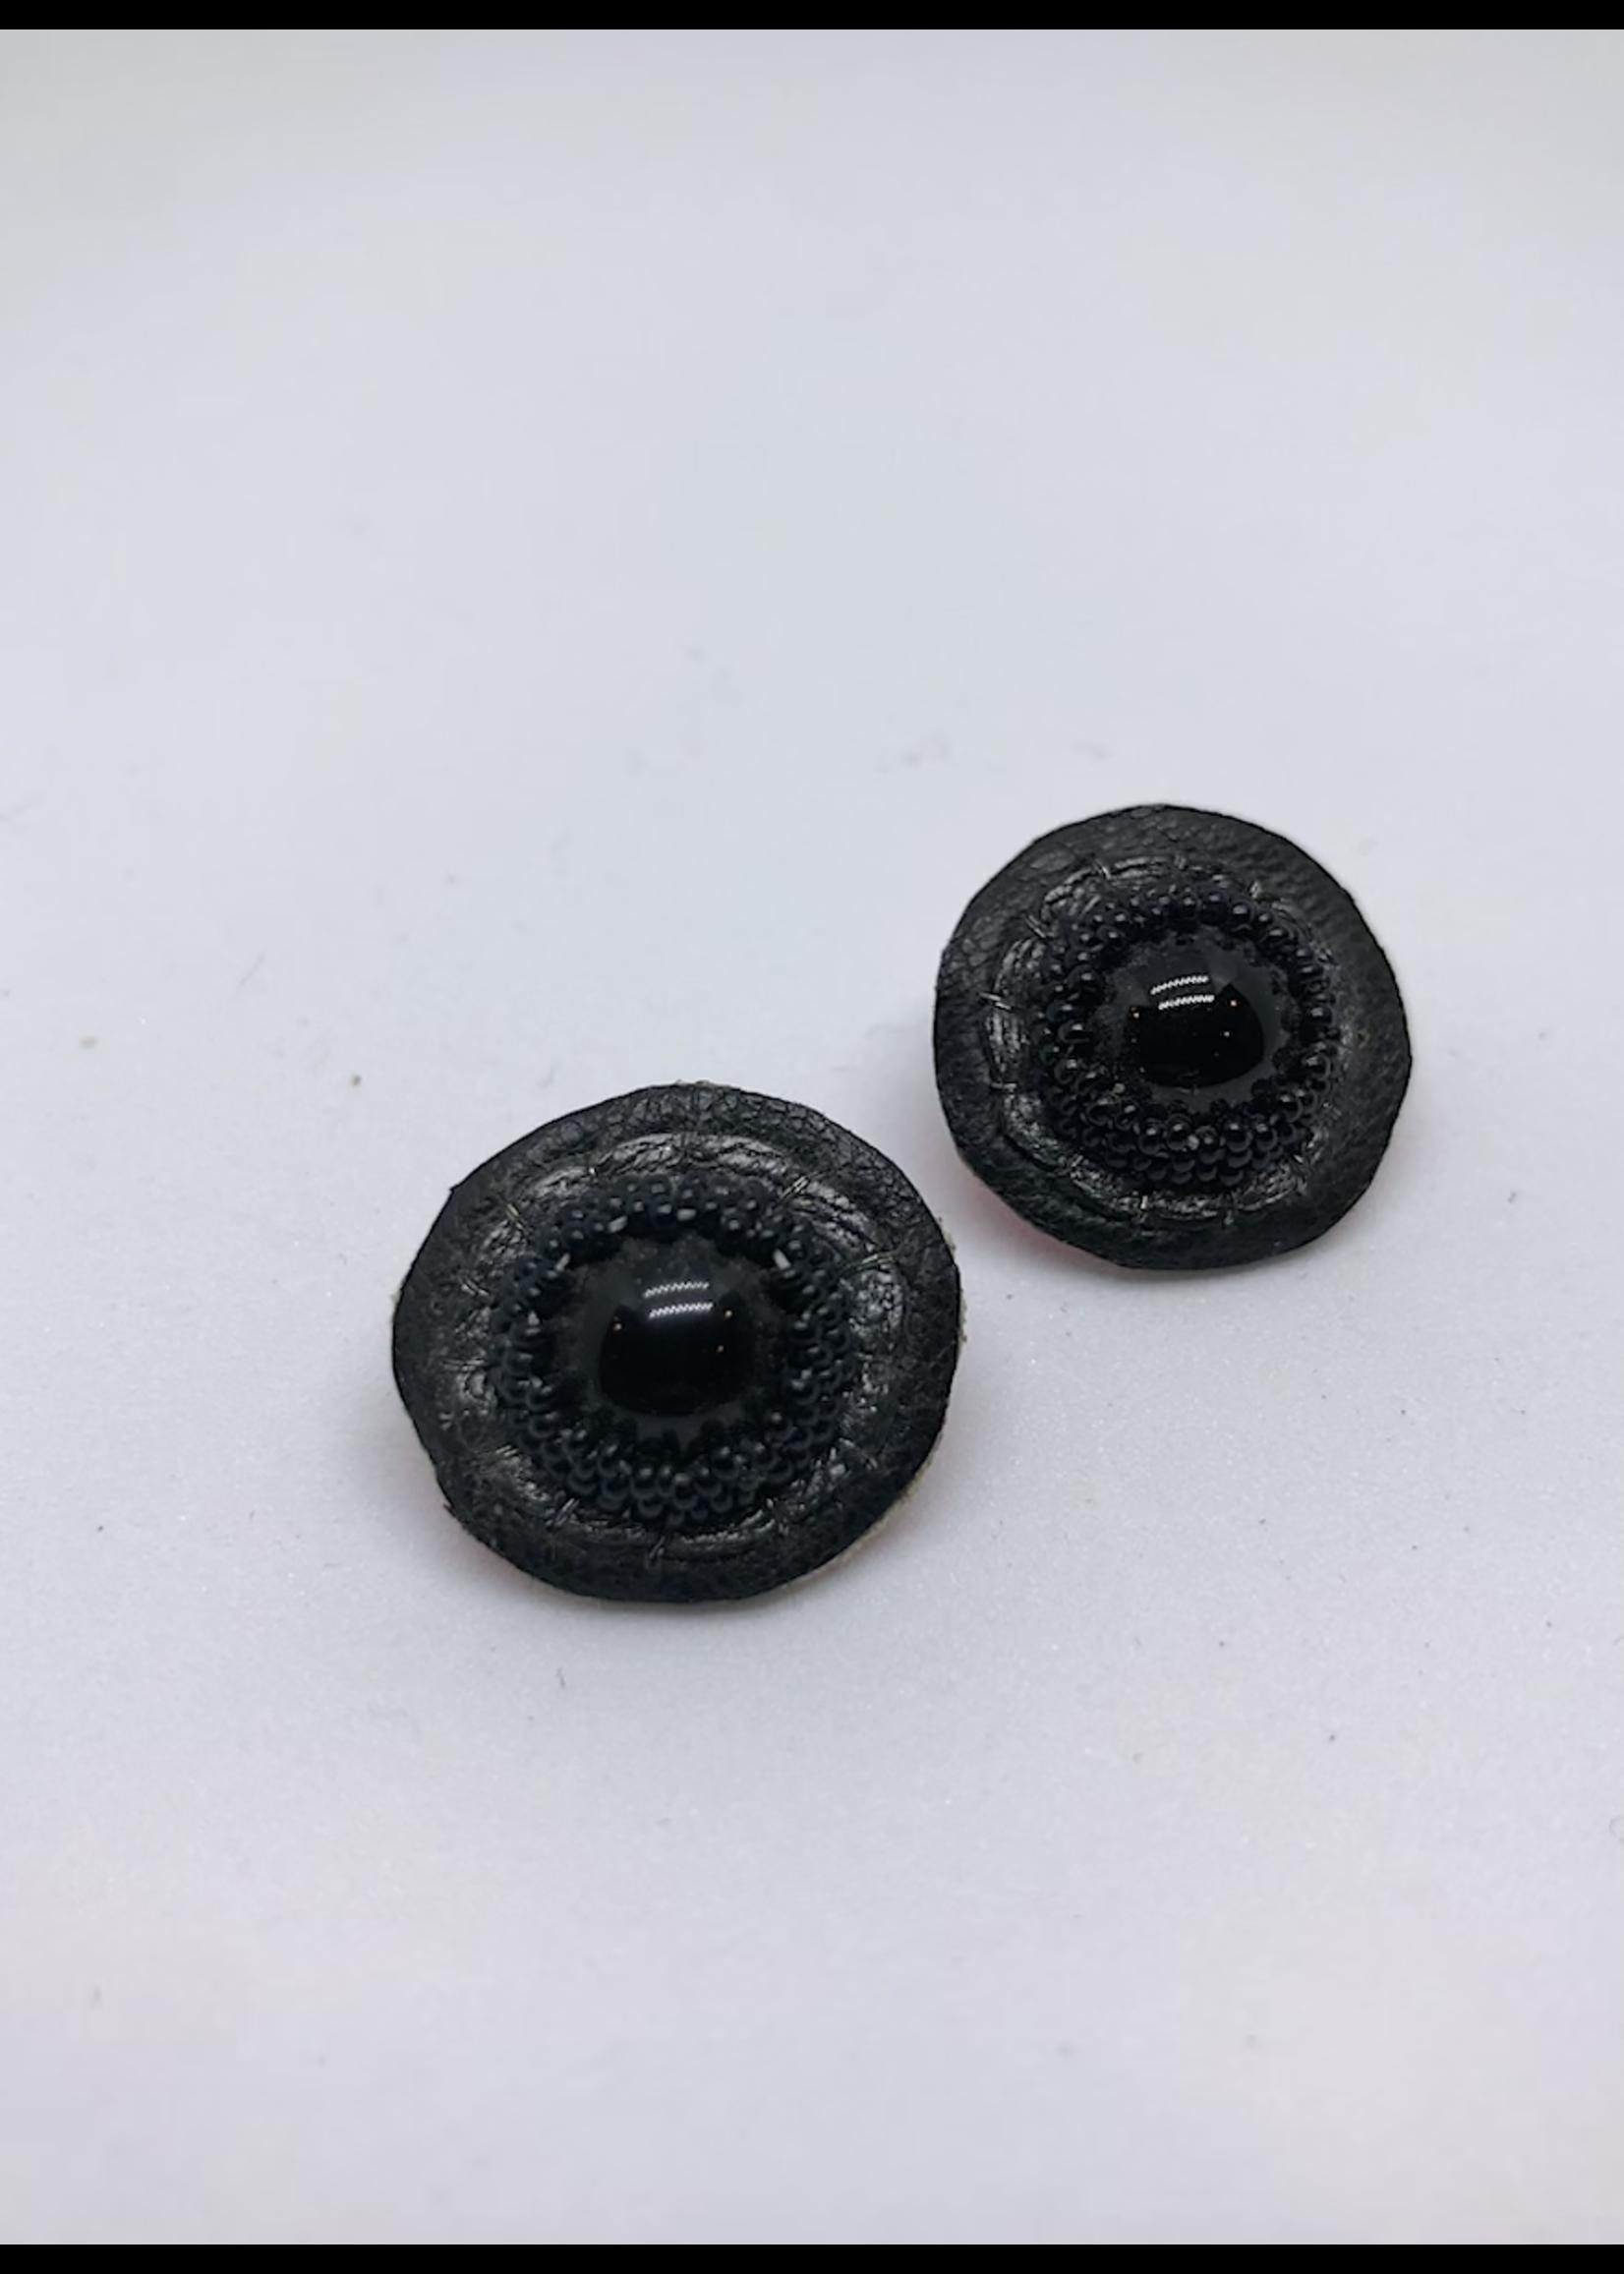 Robin Mollicone Small Stud Earrings (Black)